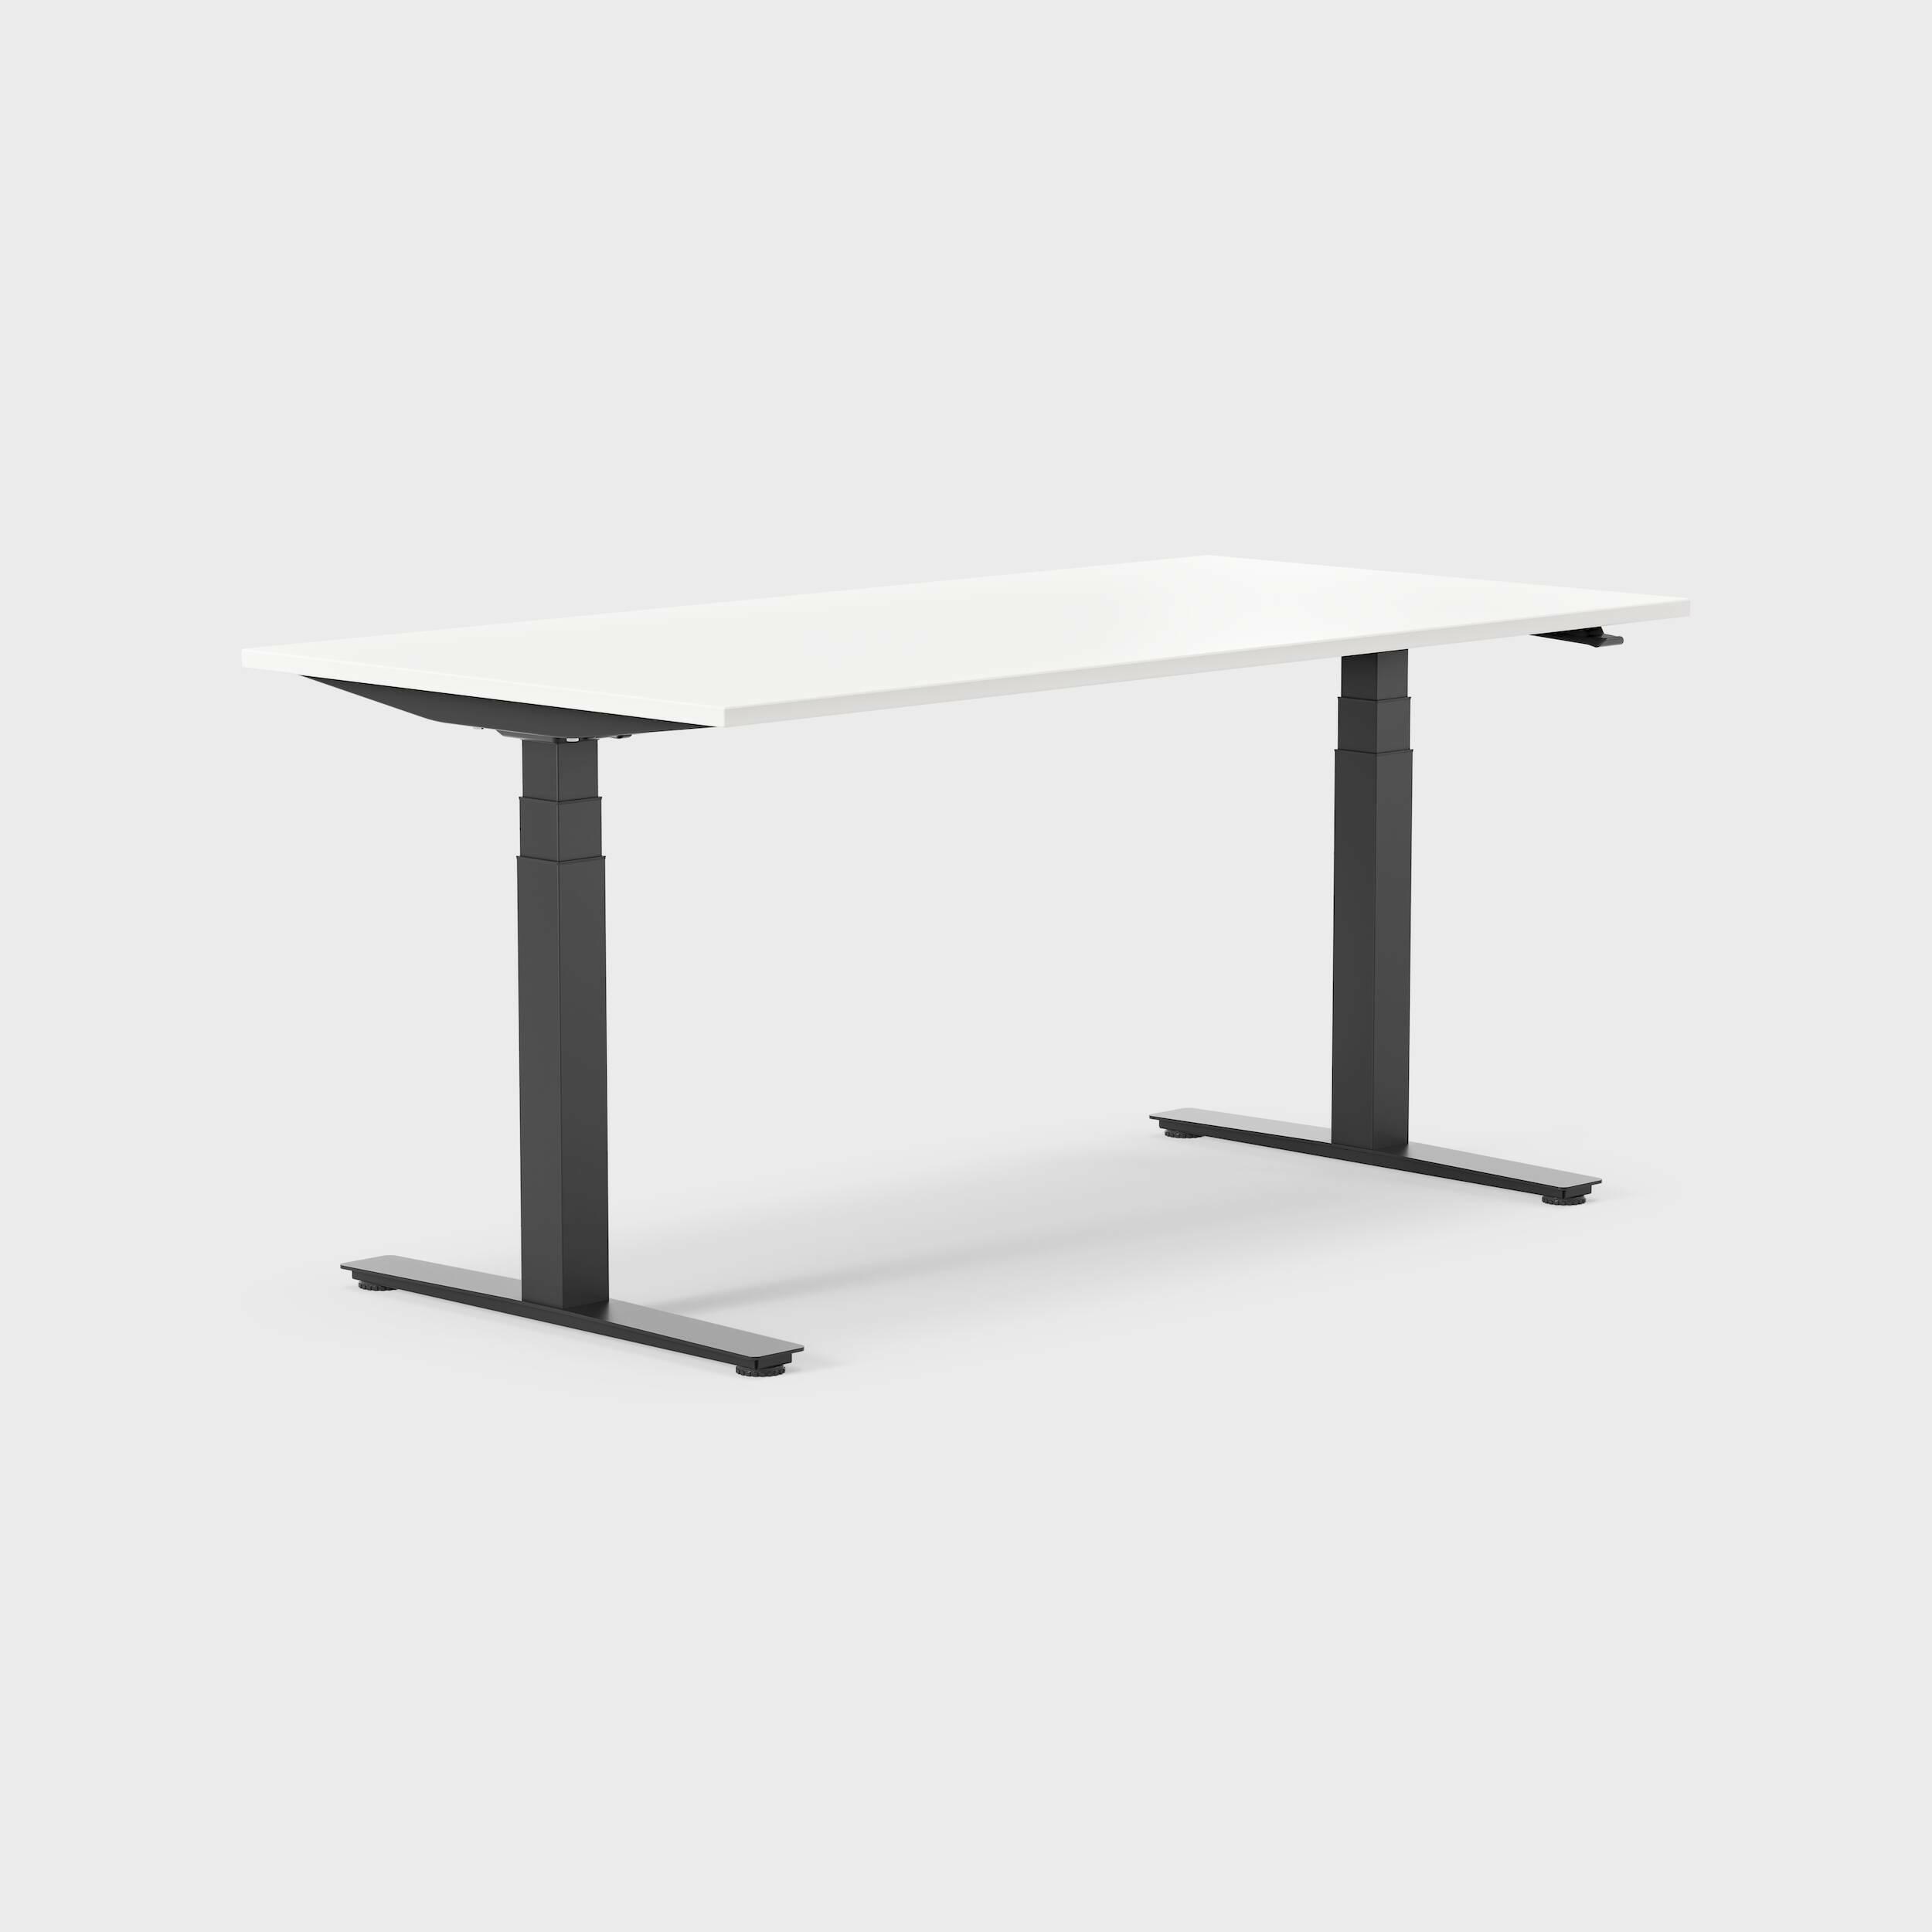 Hjørneskrivebord MODULUS, hevsenk, 1600x2000 mm, svart